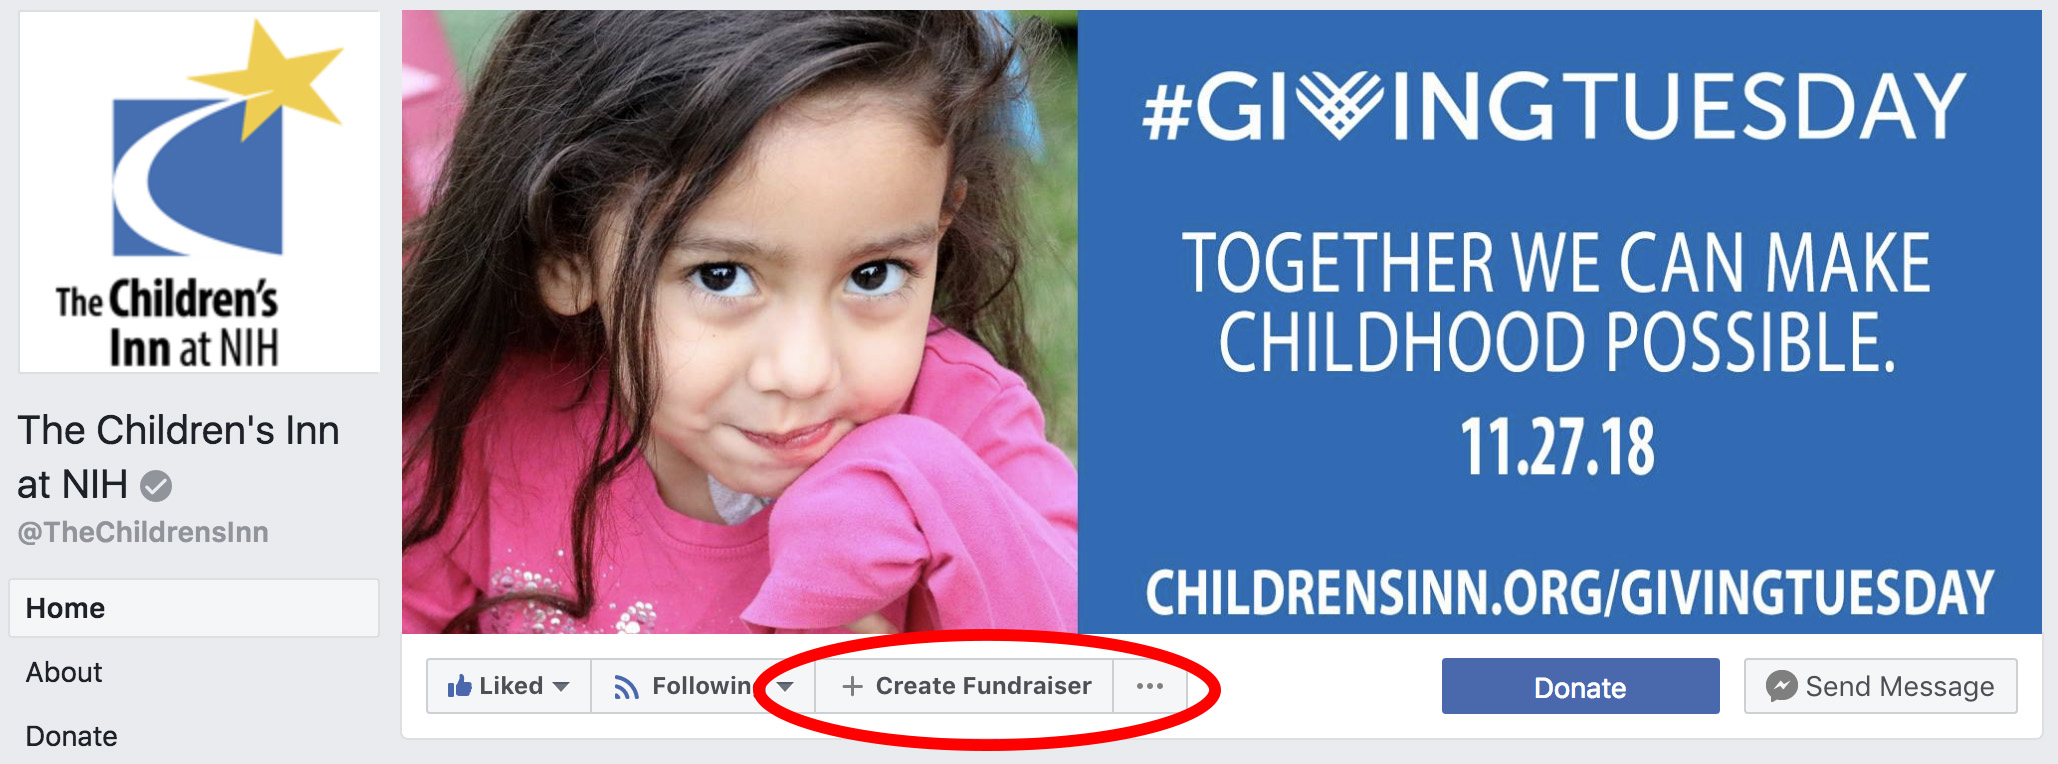 FB Fundraiser Step 1